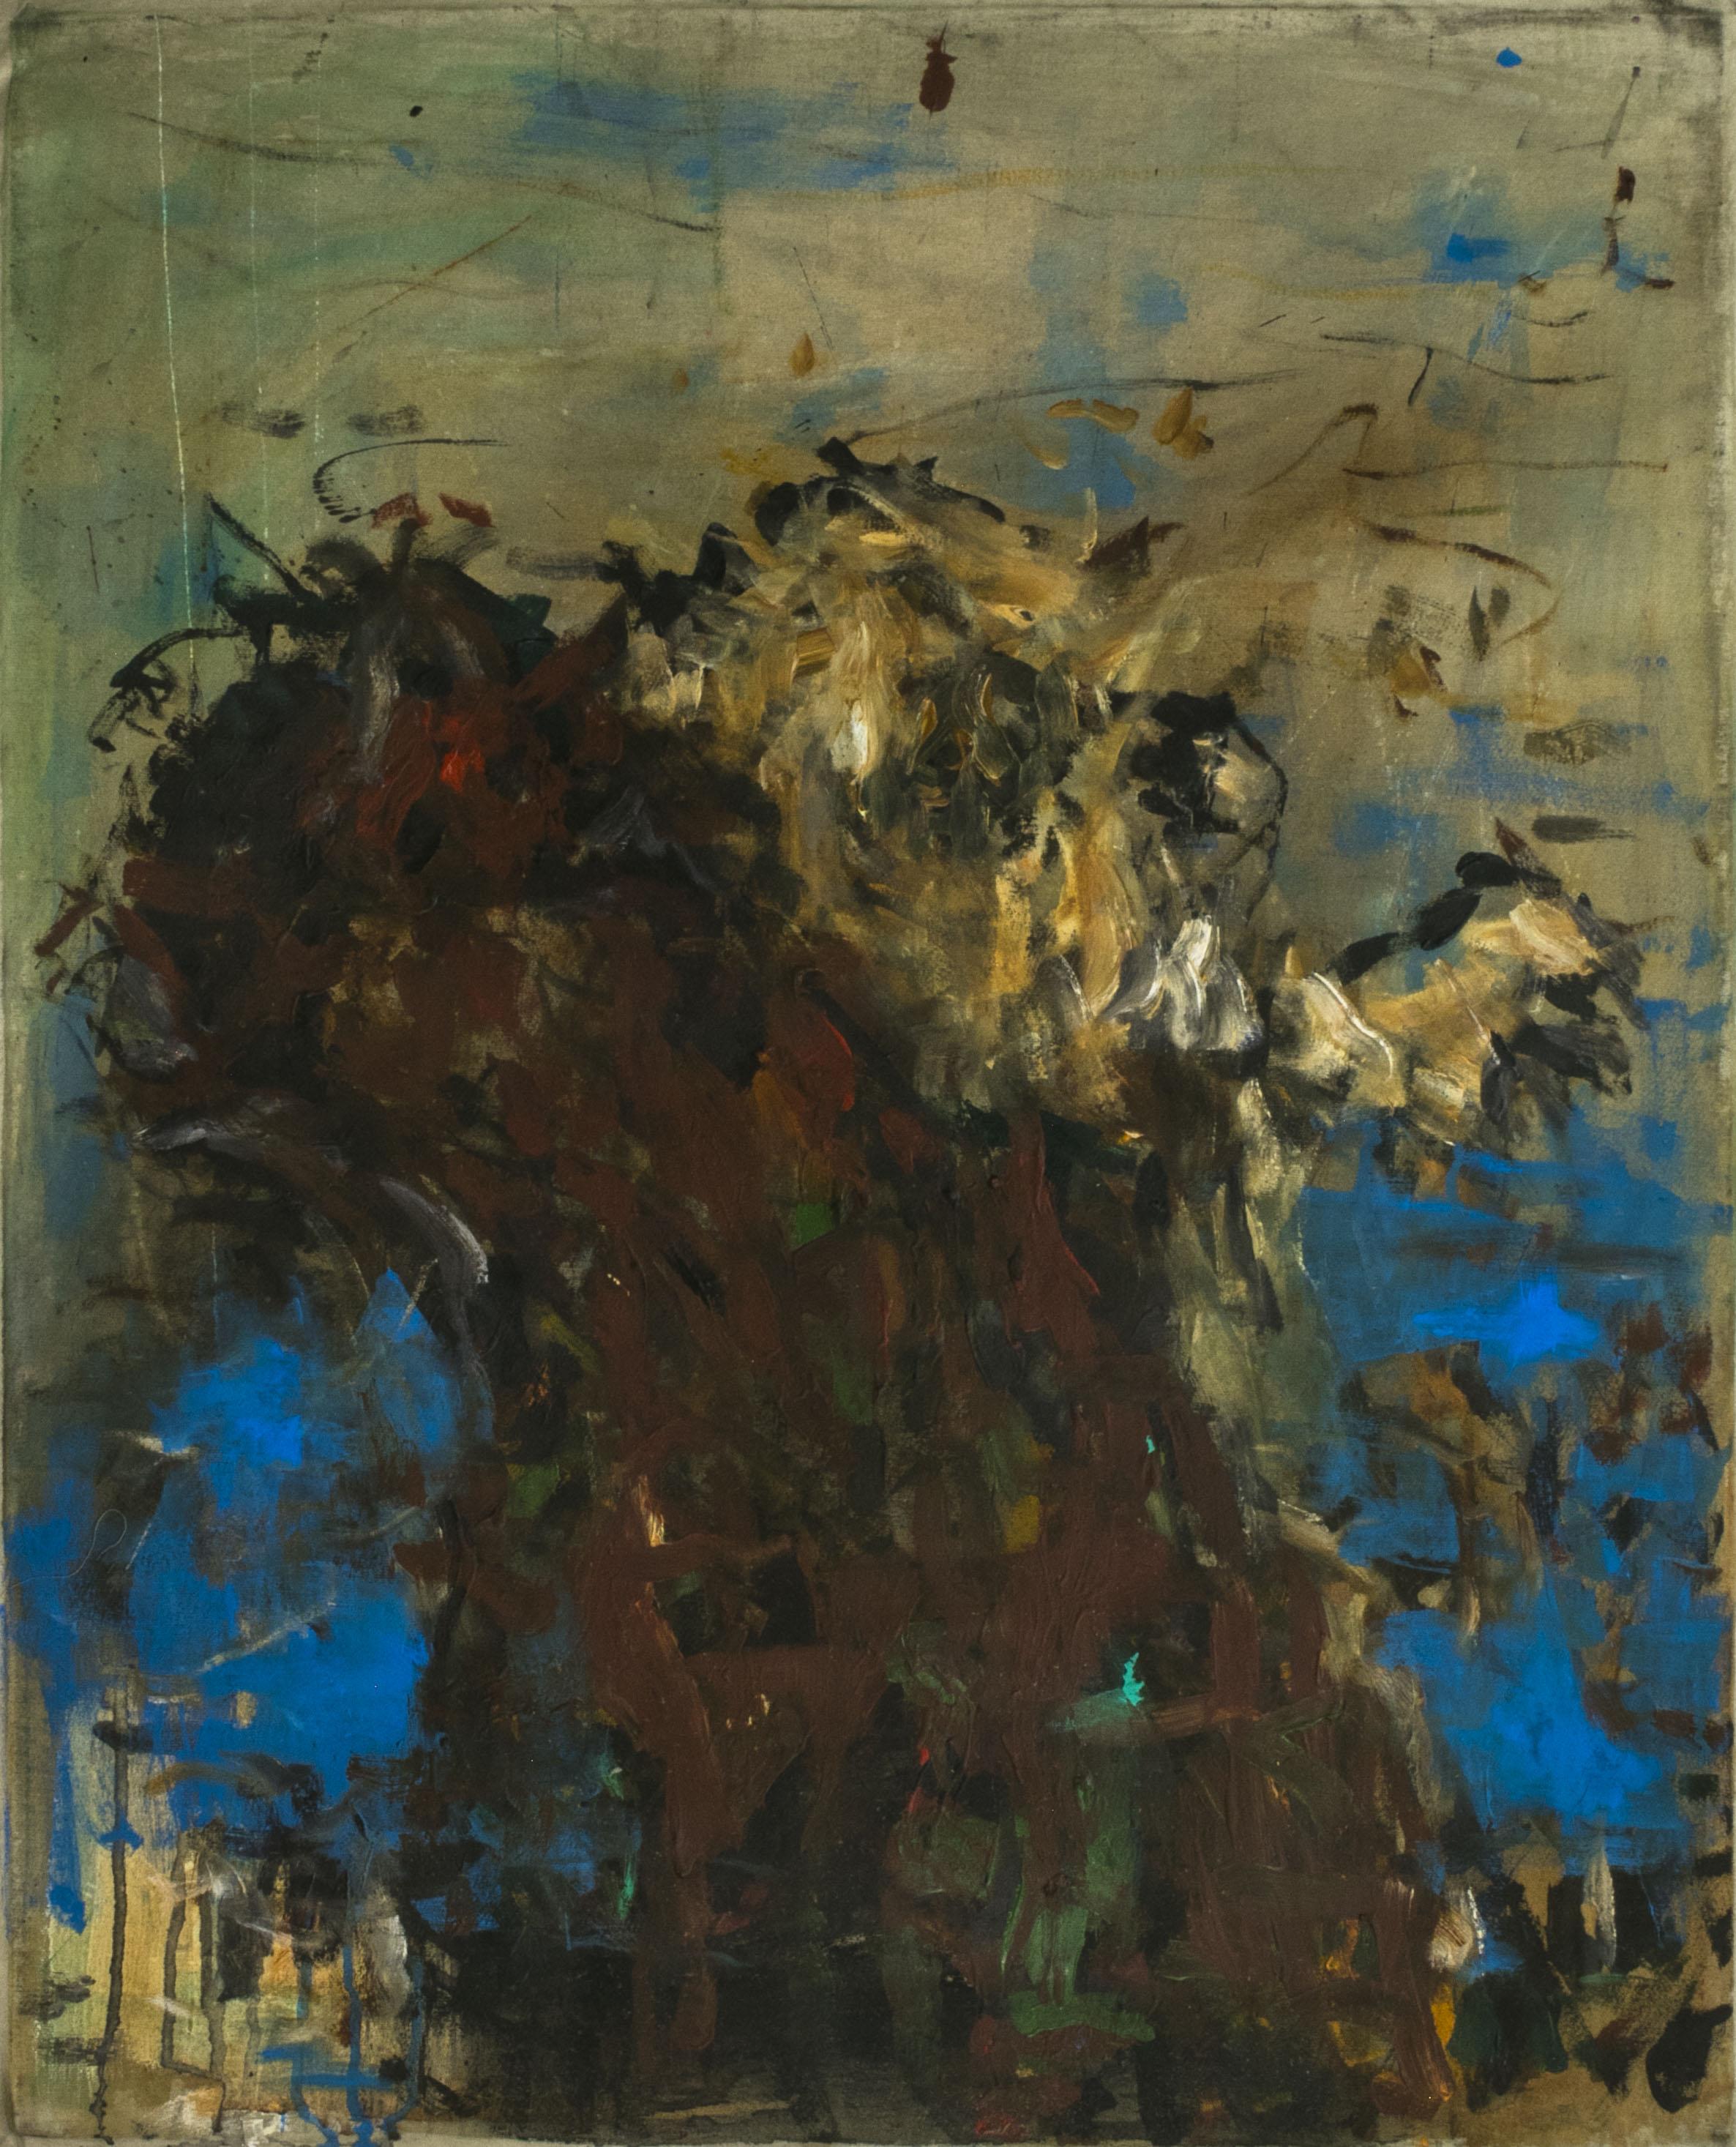 C54_Cat_mixed media on canvas 100x70 cm 2005_1